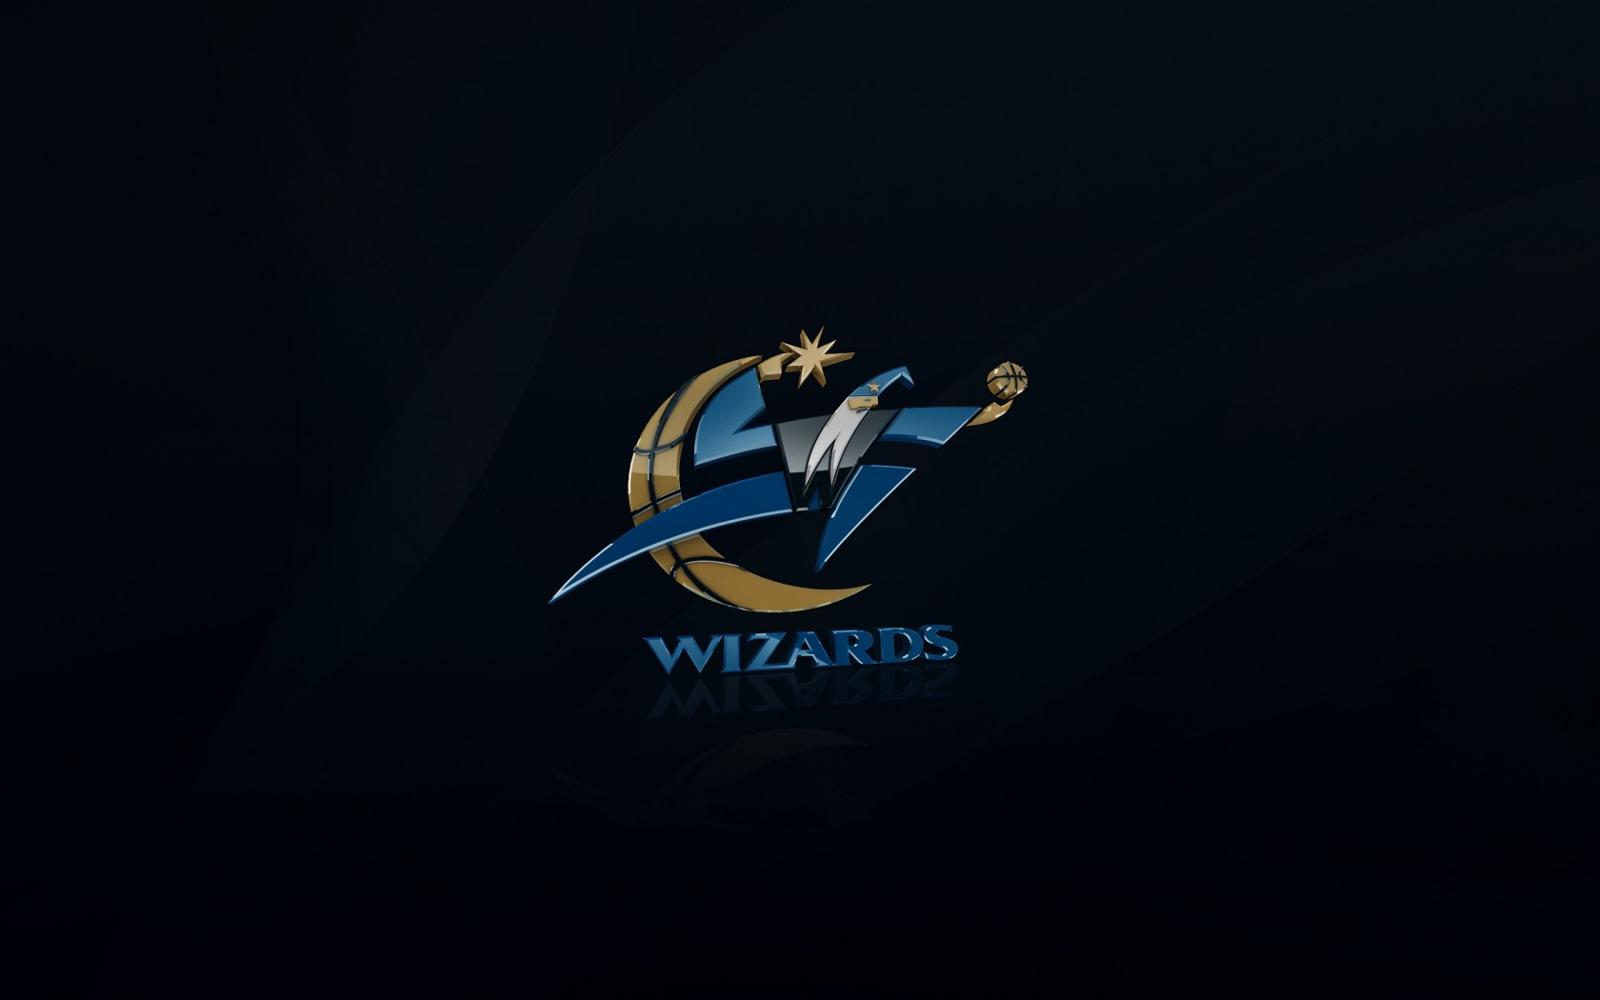 washington wizards 2013 logo nba usa hd desktop wallpaper